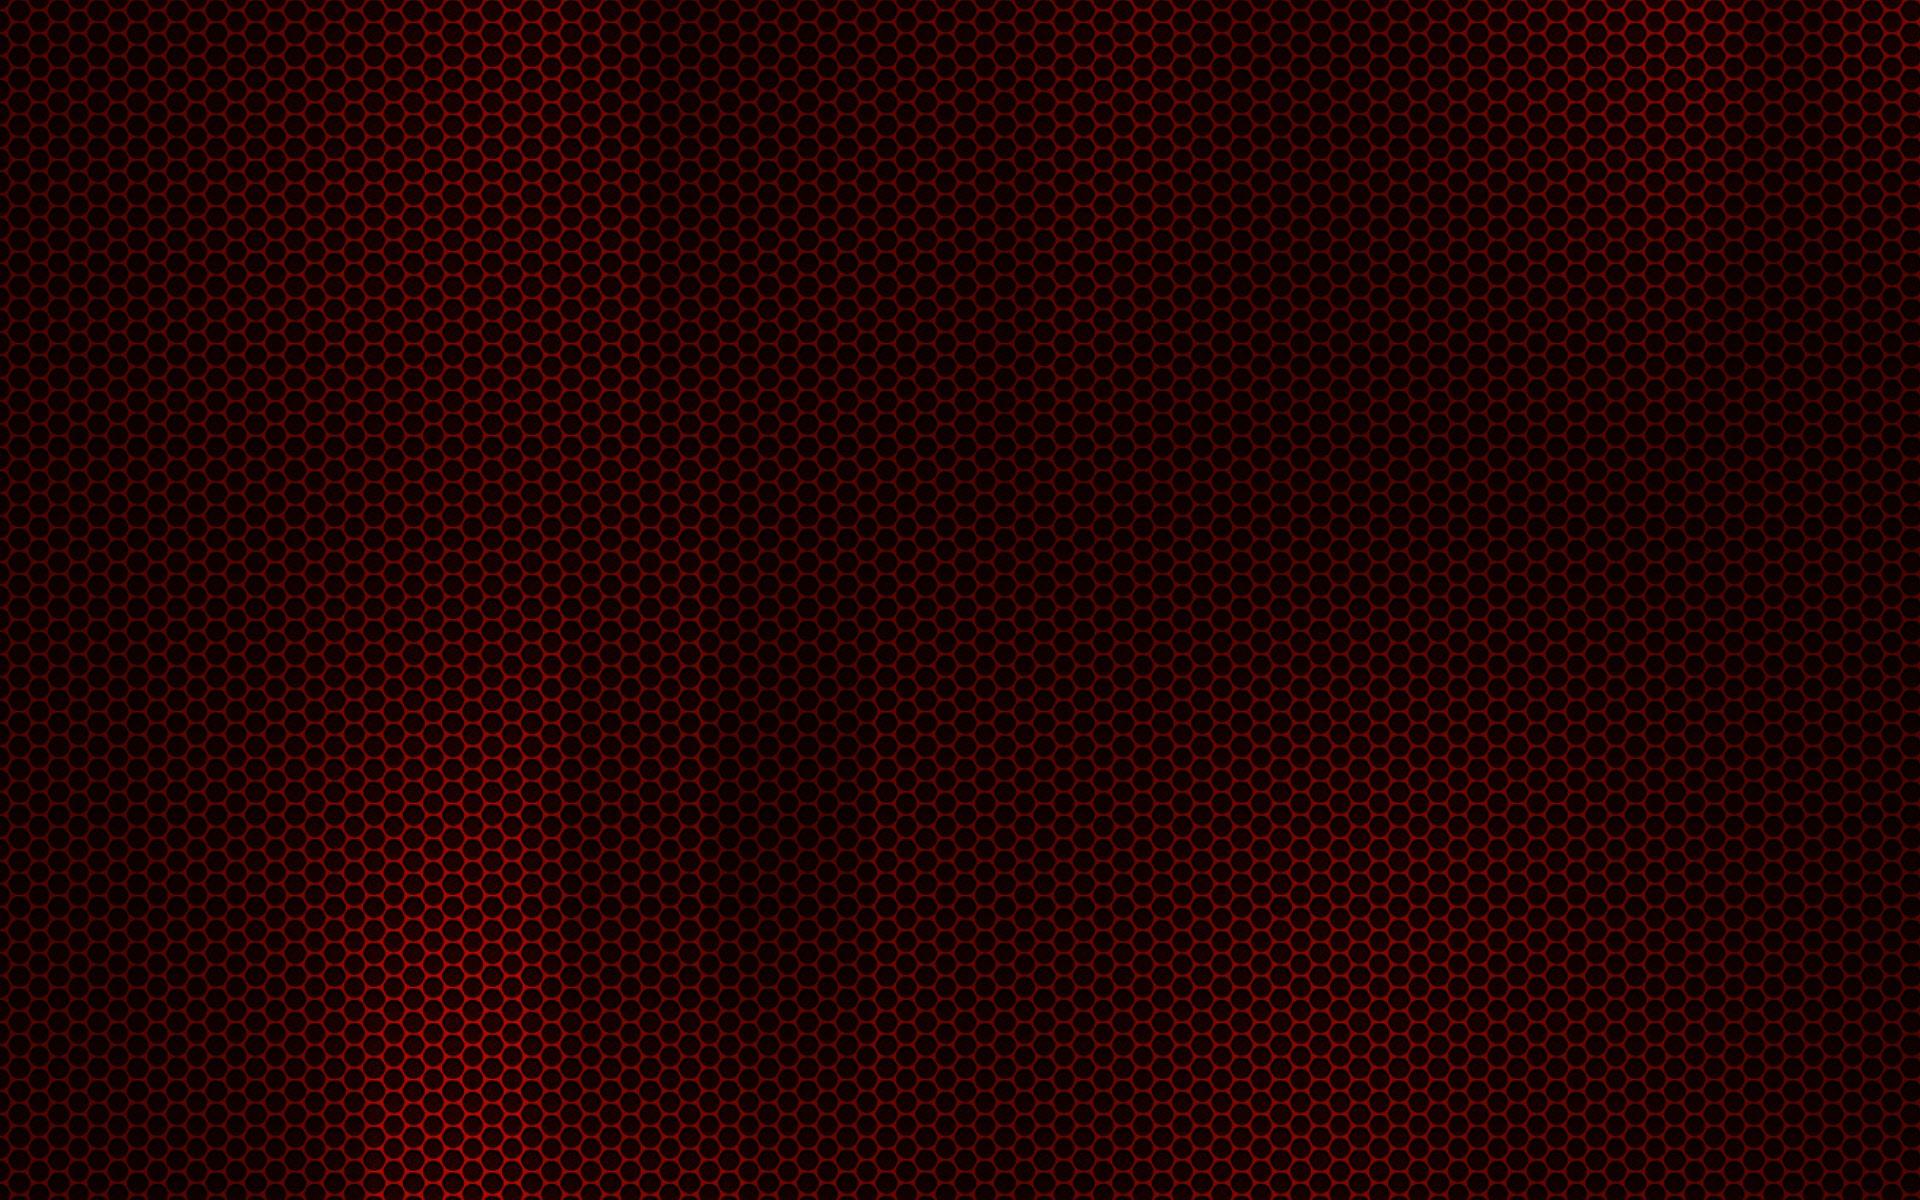 1920x1080 Jack Nicholson Shining Wallpaper WallpaperSafari